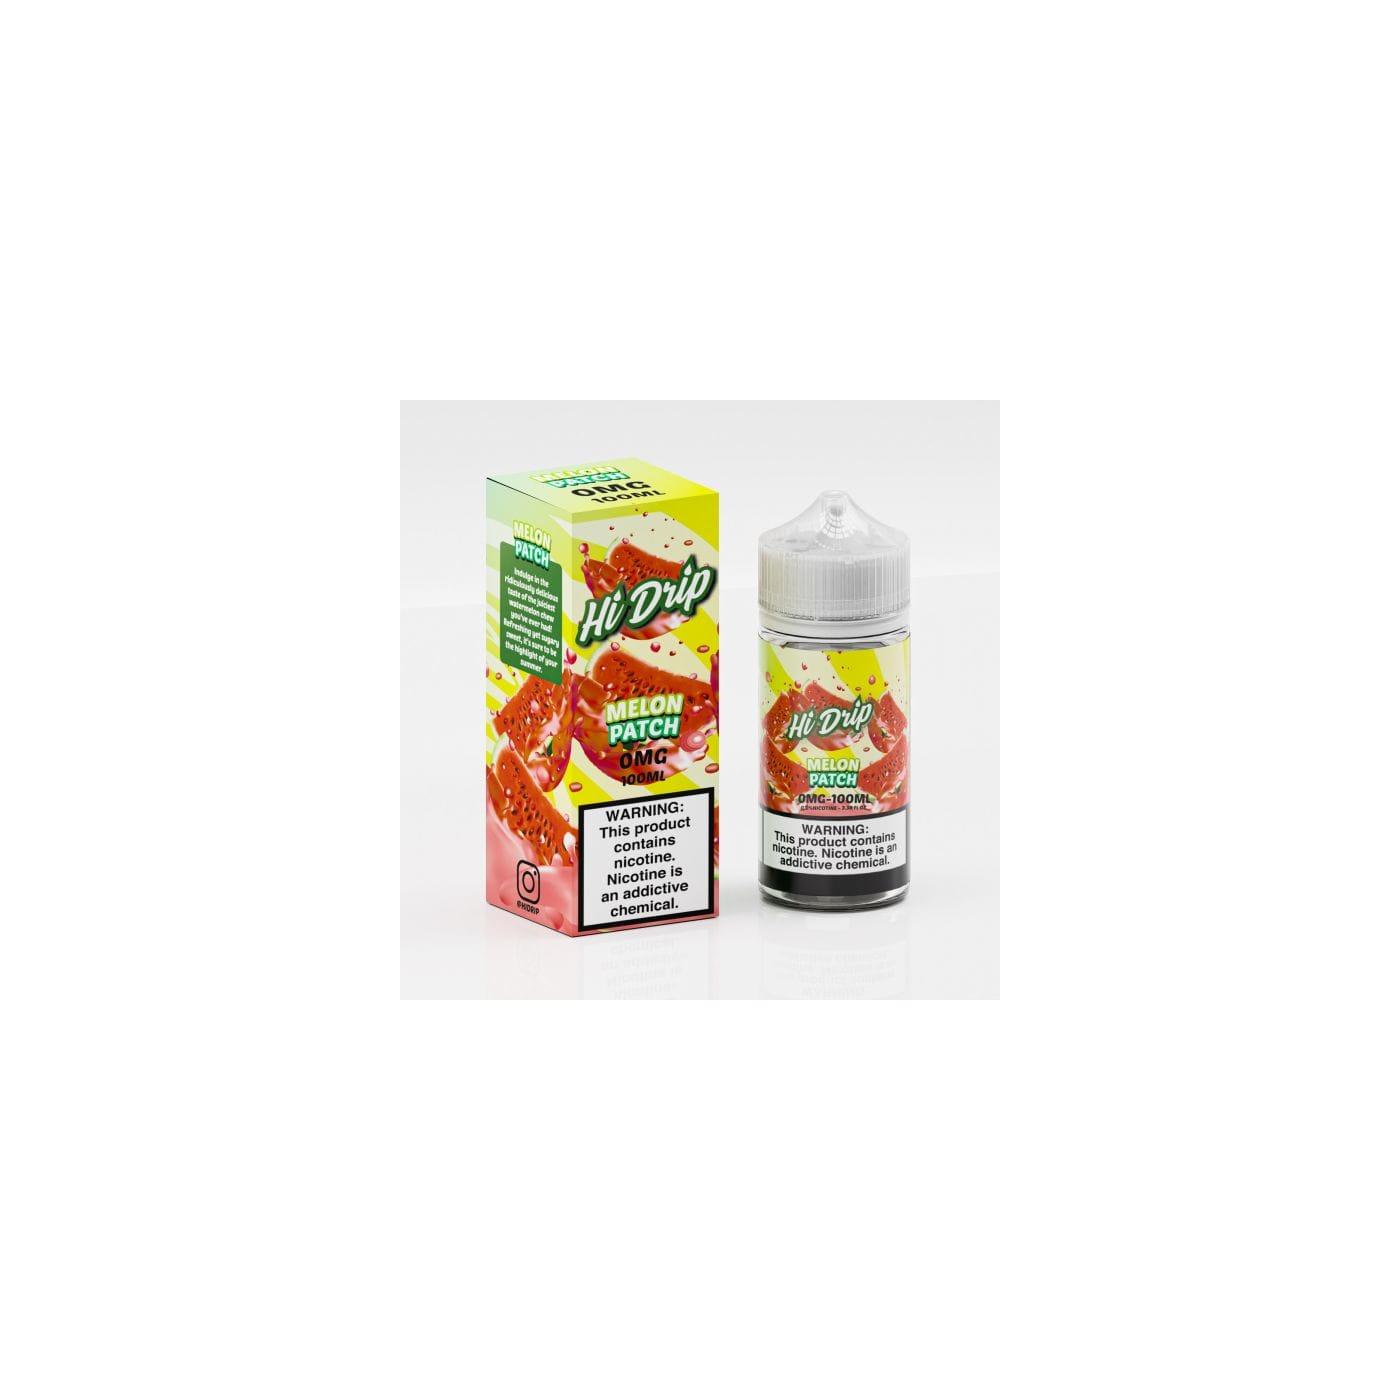 Hi-Drip Melon Patch